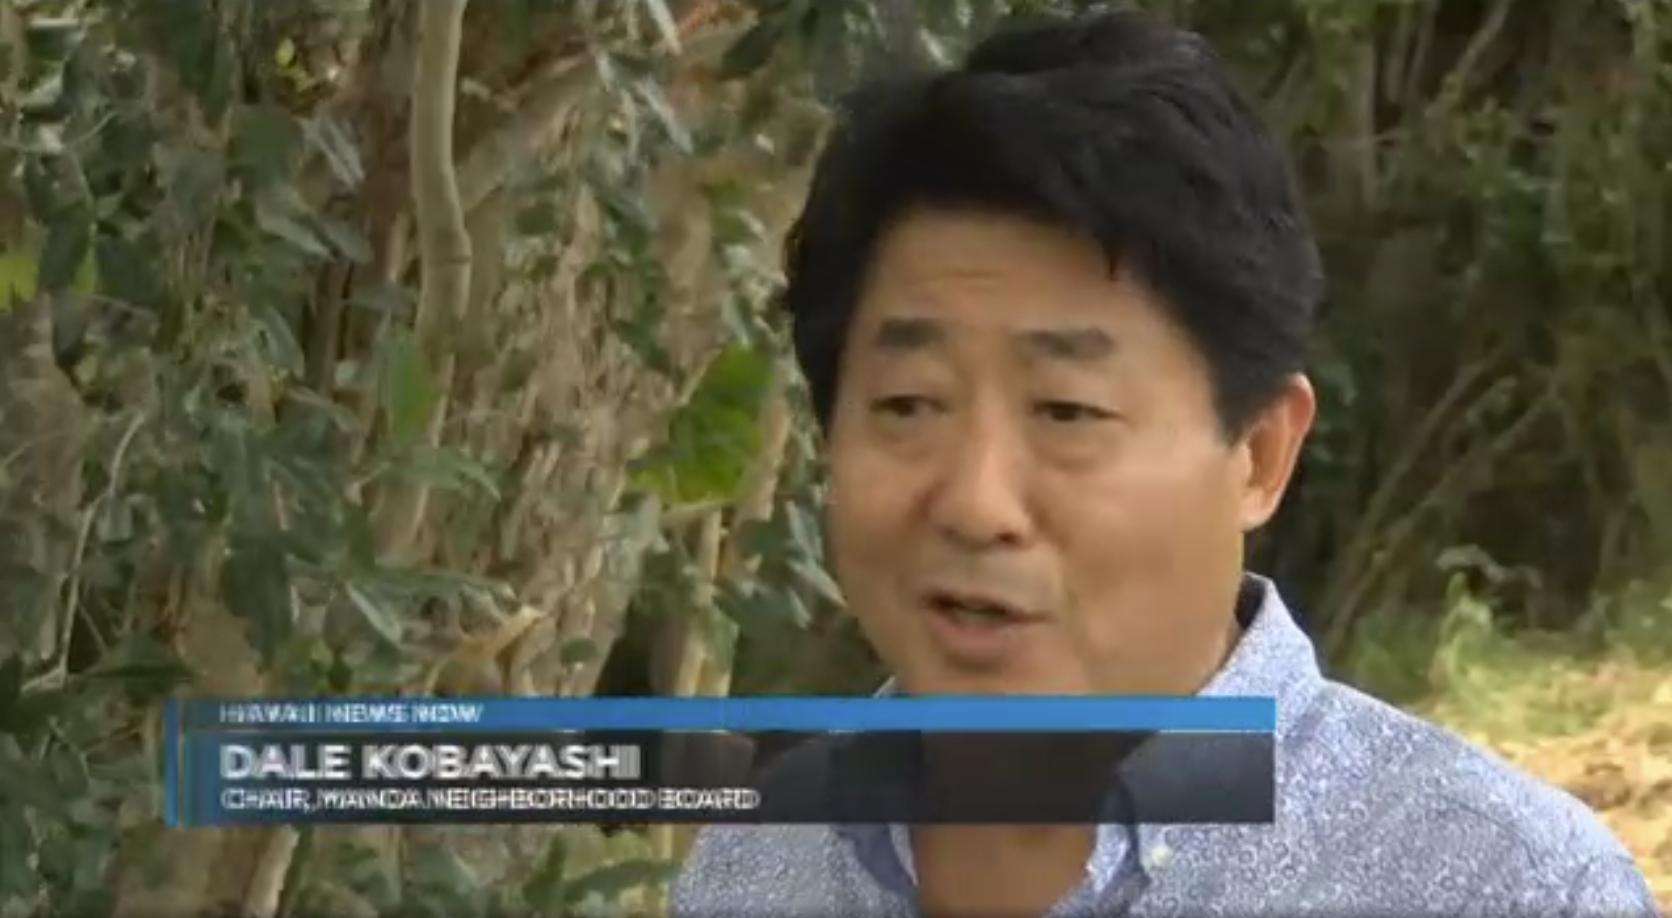 Dale Kobayashi fights to preserve Manoa's iconic trees.